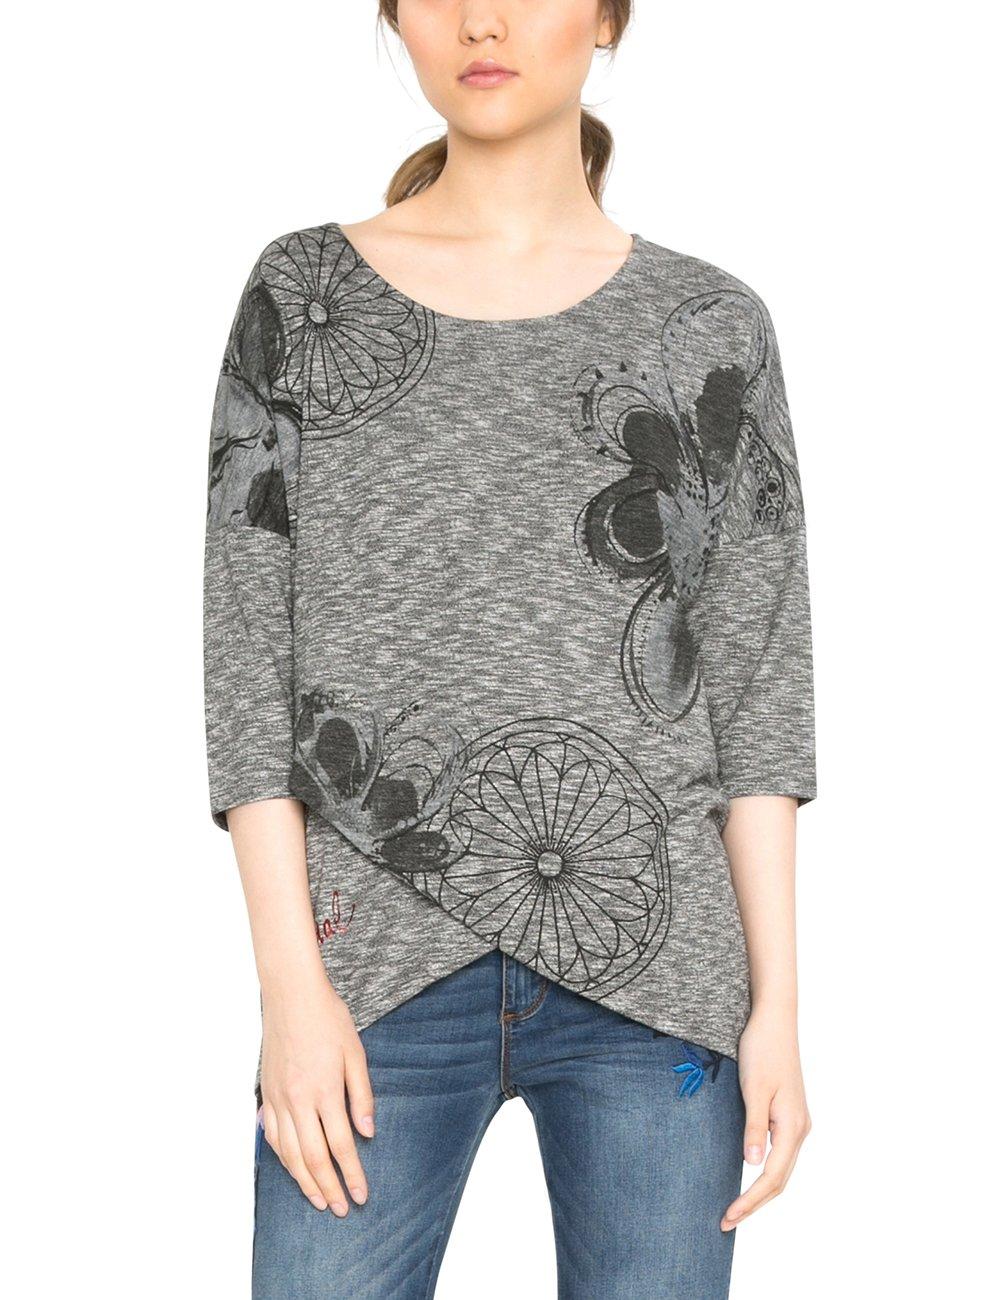 Desigual Ts_olivia, Camiseta para Mujer